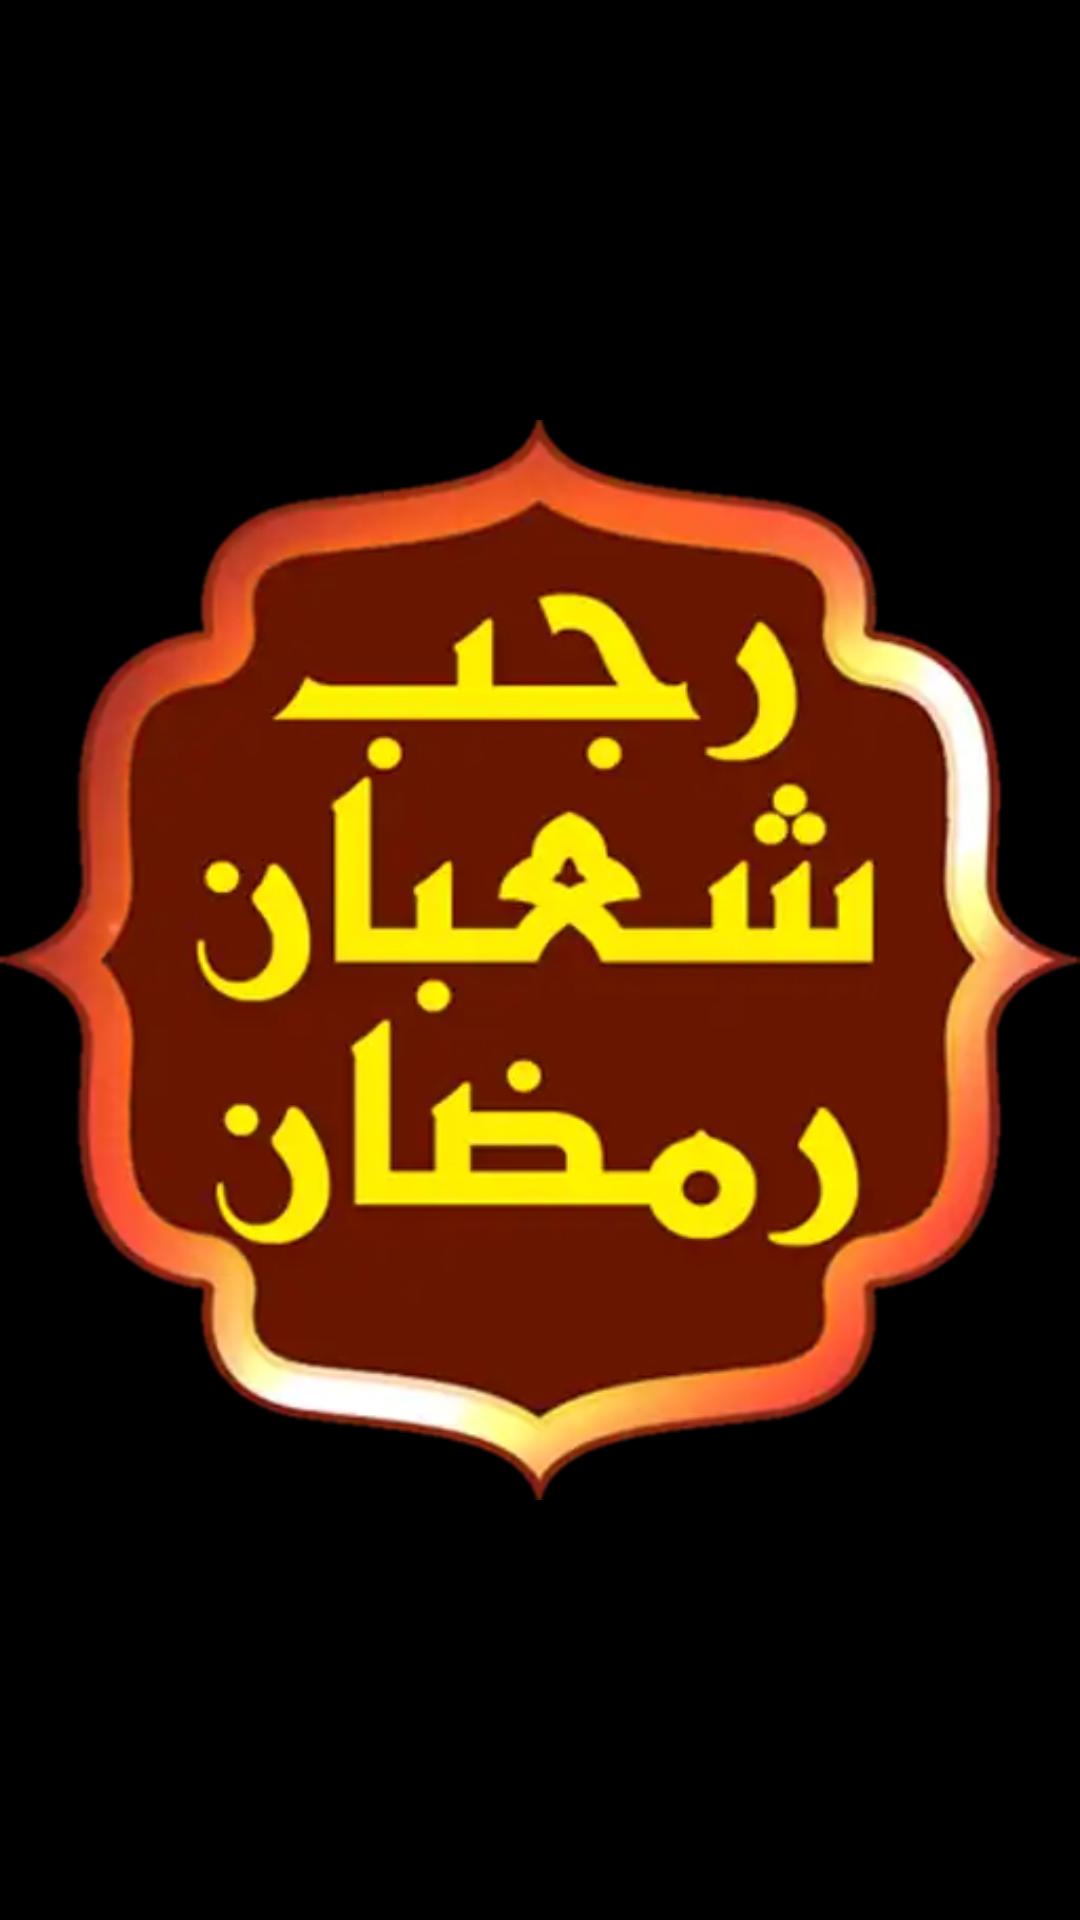 برنامج اعمال شهر رجب وشعبان ورمضان وموعد امساكيه رمضان 2020 Calm Artwork Calm Keep Calm Artwork